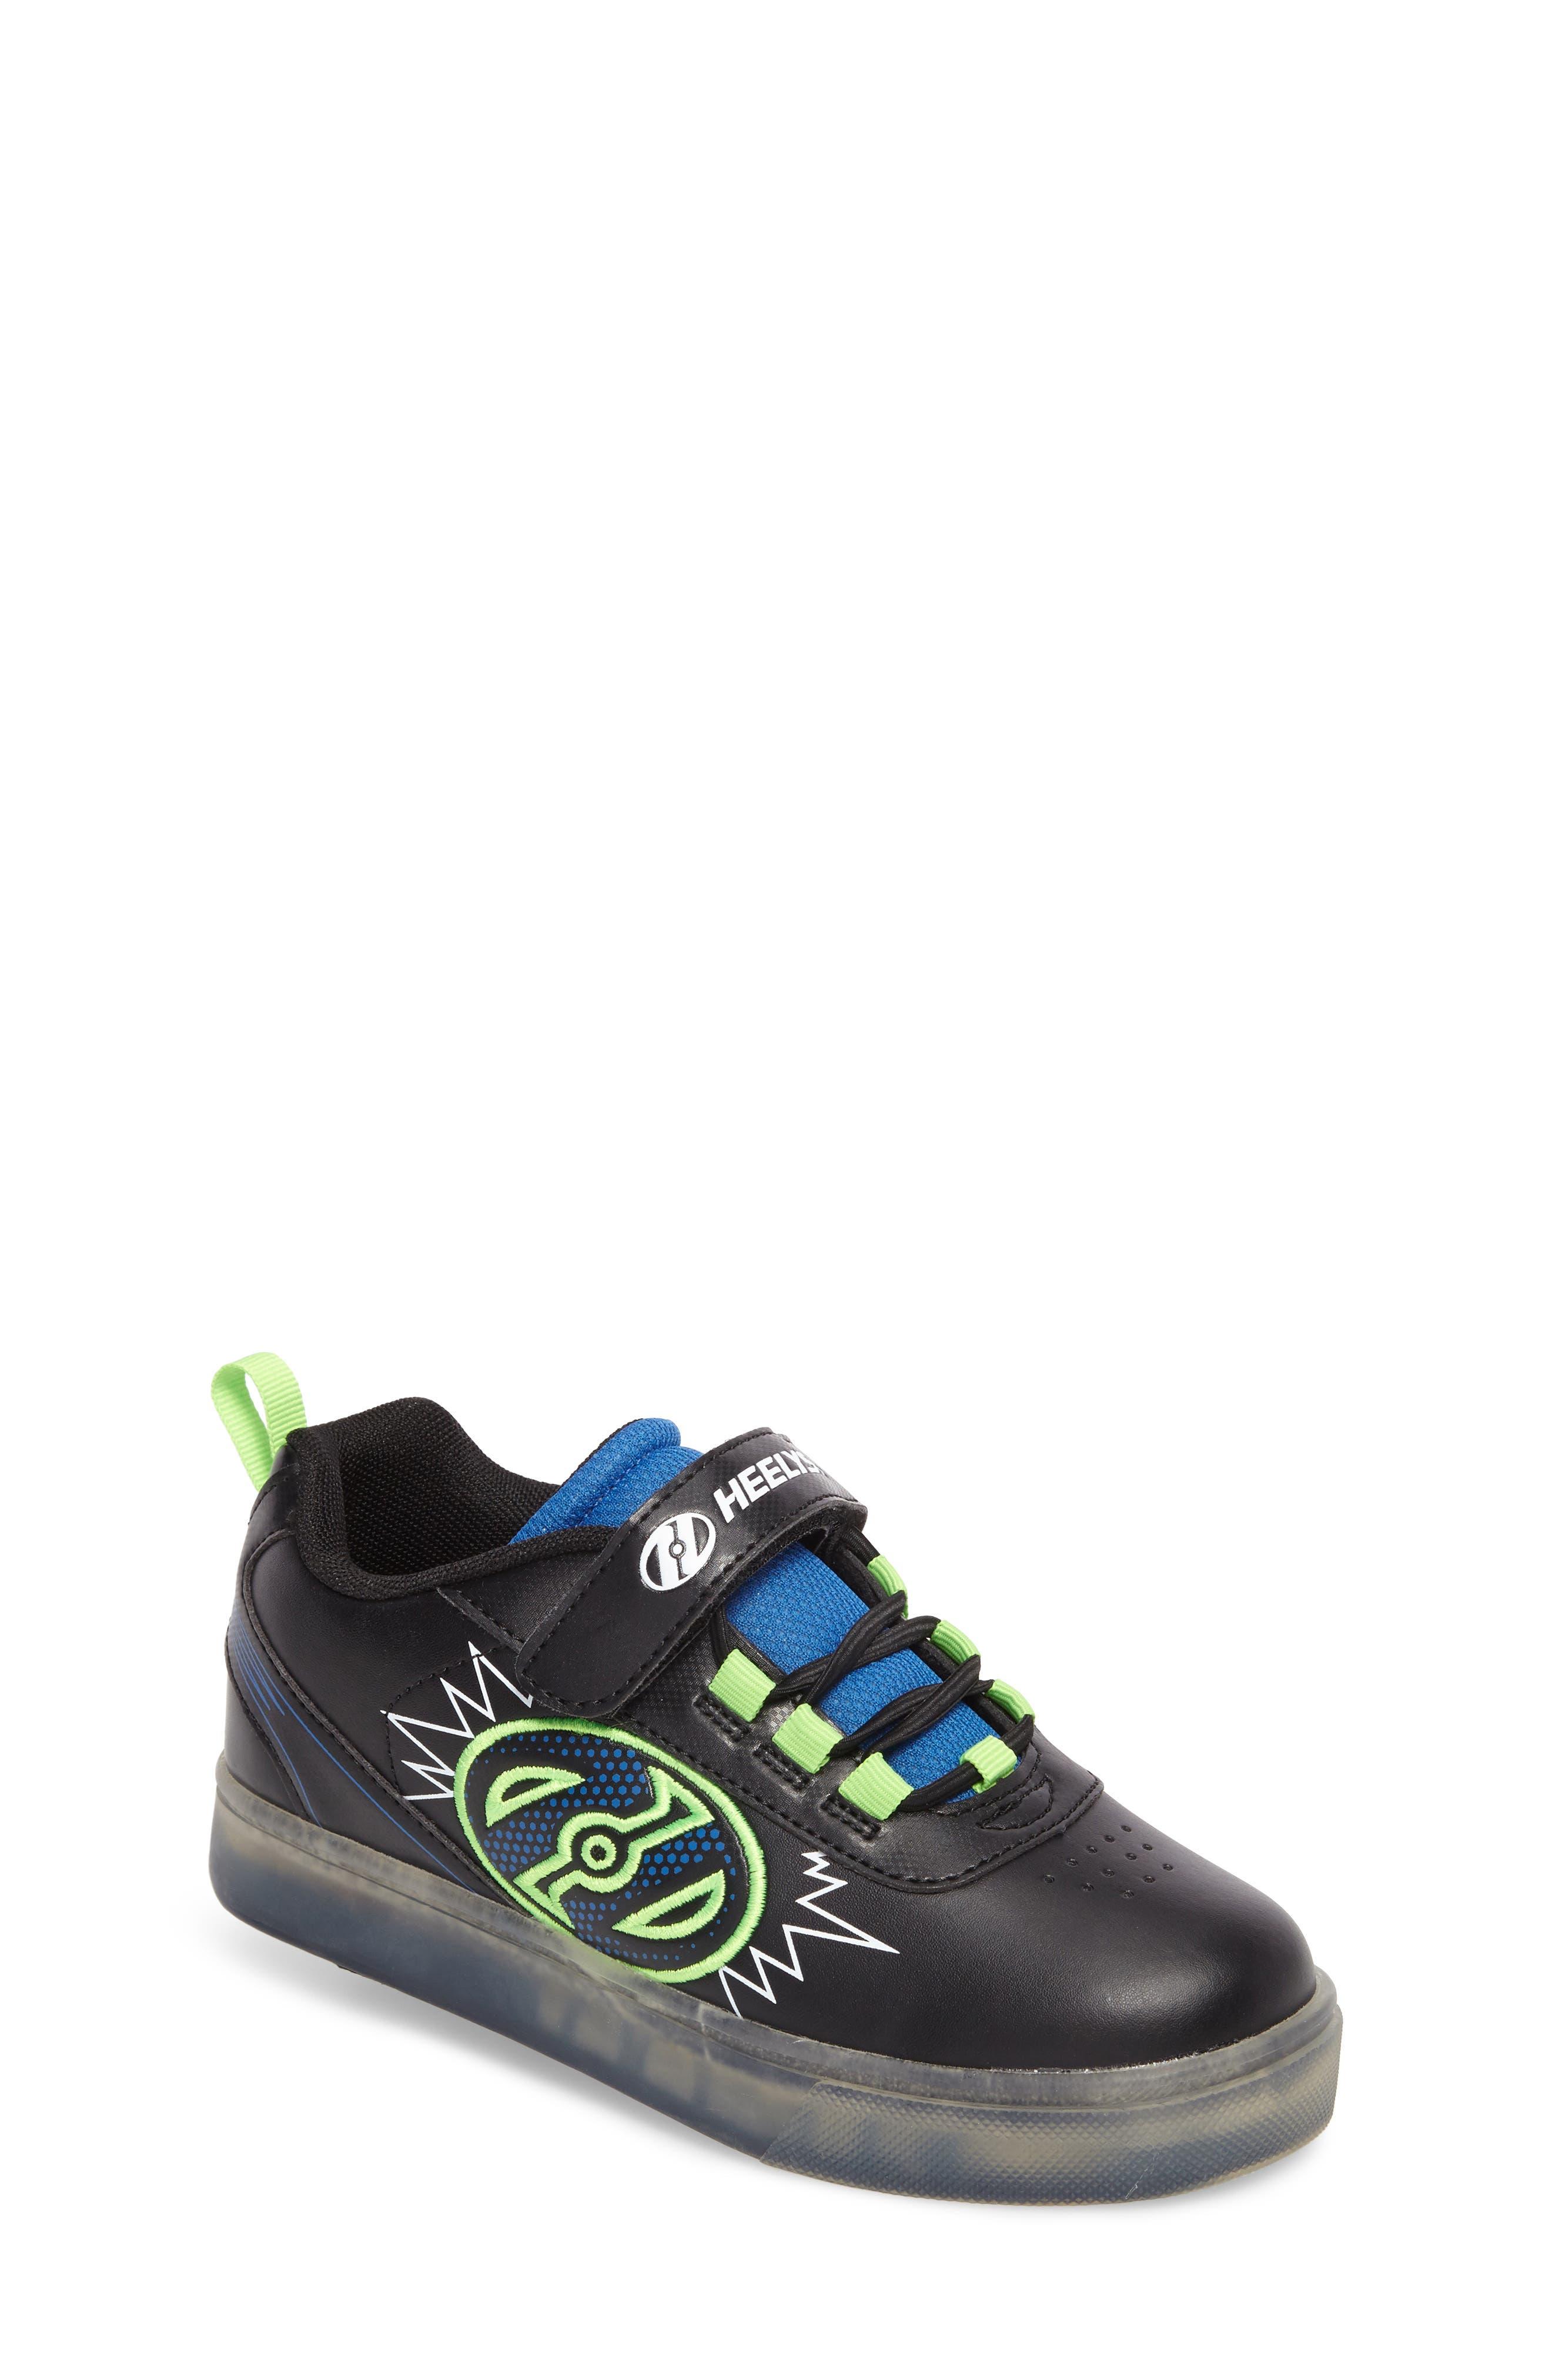 Pow X2 Light-Up Wheeled Skate Sneaker,                         Main,                         color, Black/ Blue/ Green